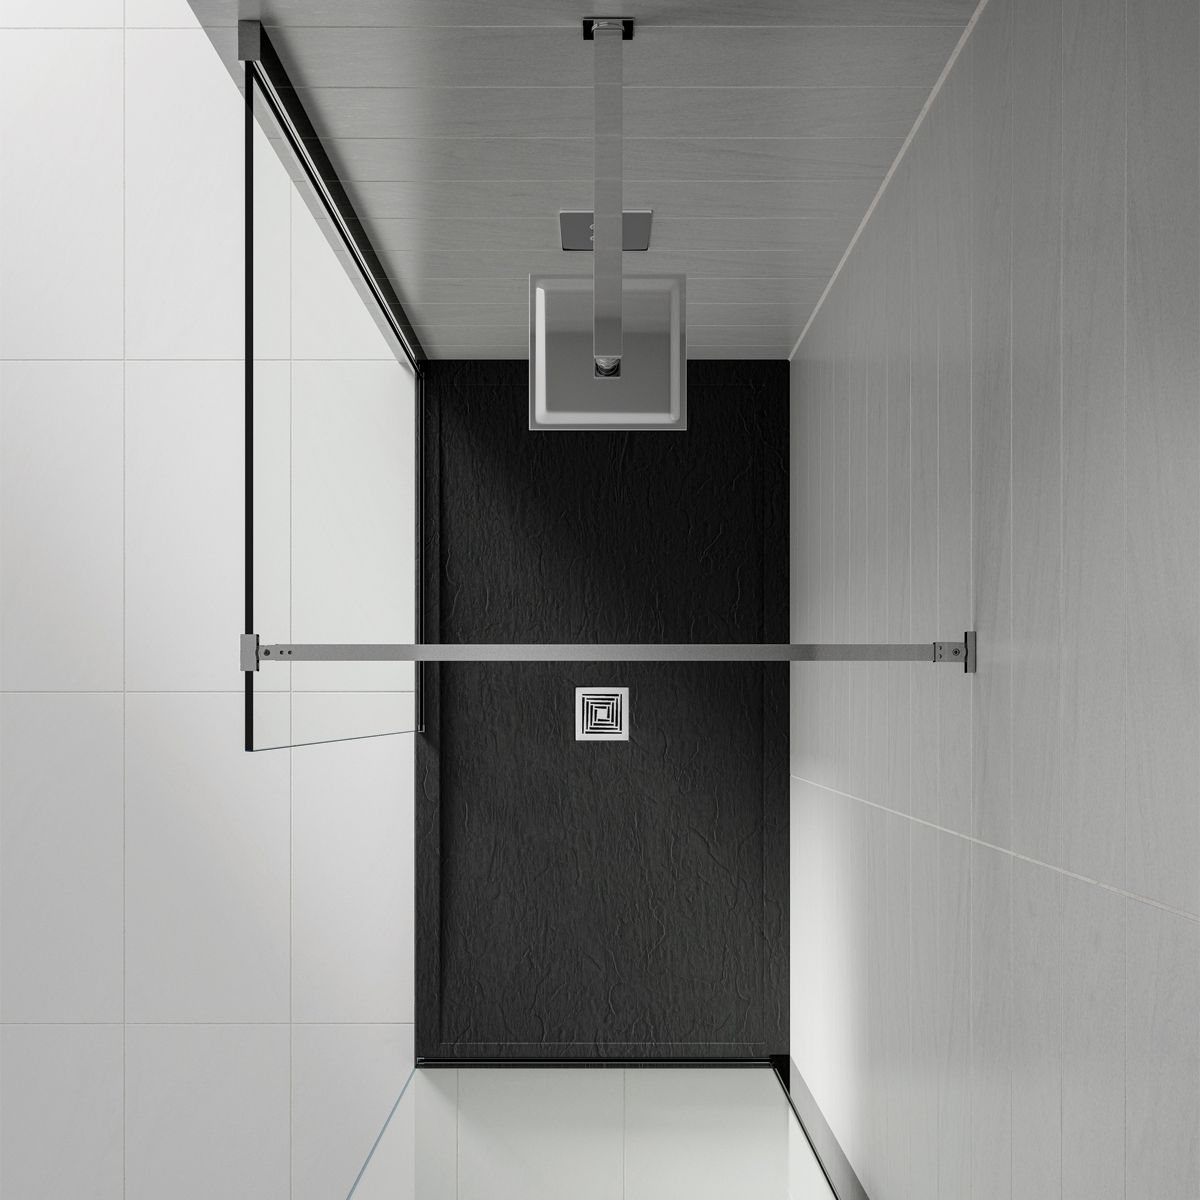 Aquadart Black Slate Shower Tray 1000 x 800 Overhead